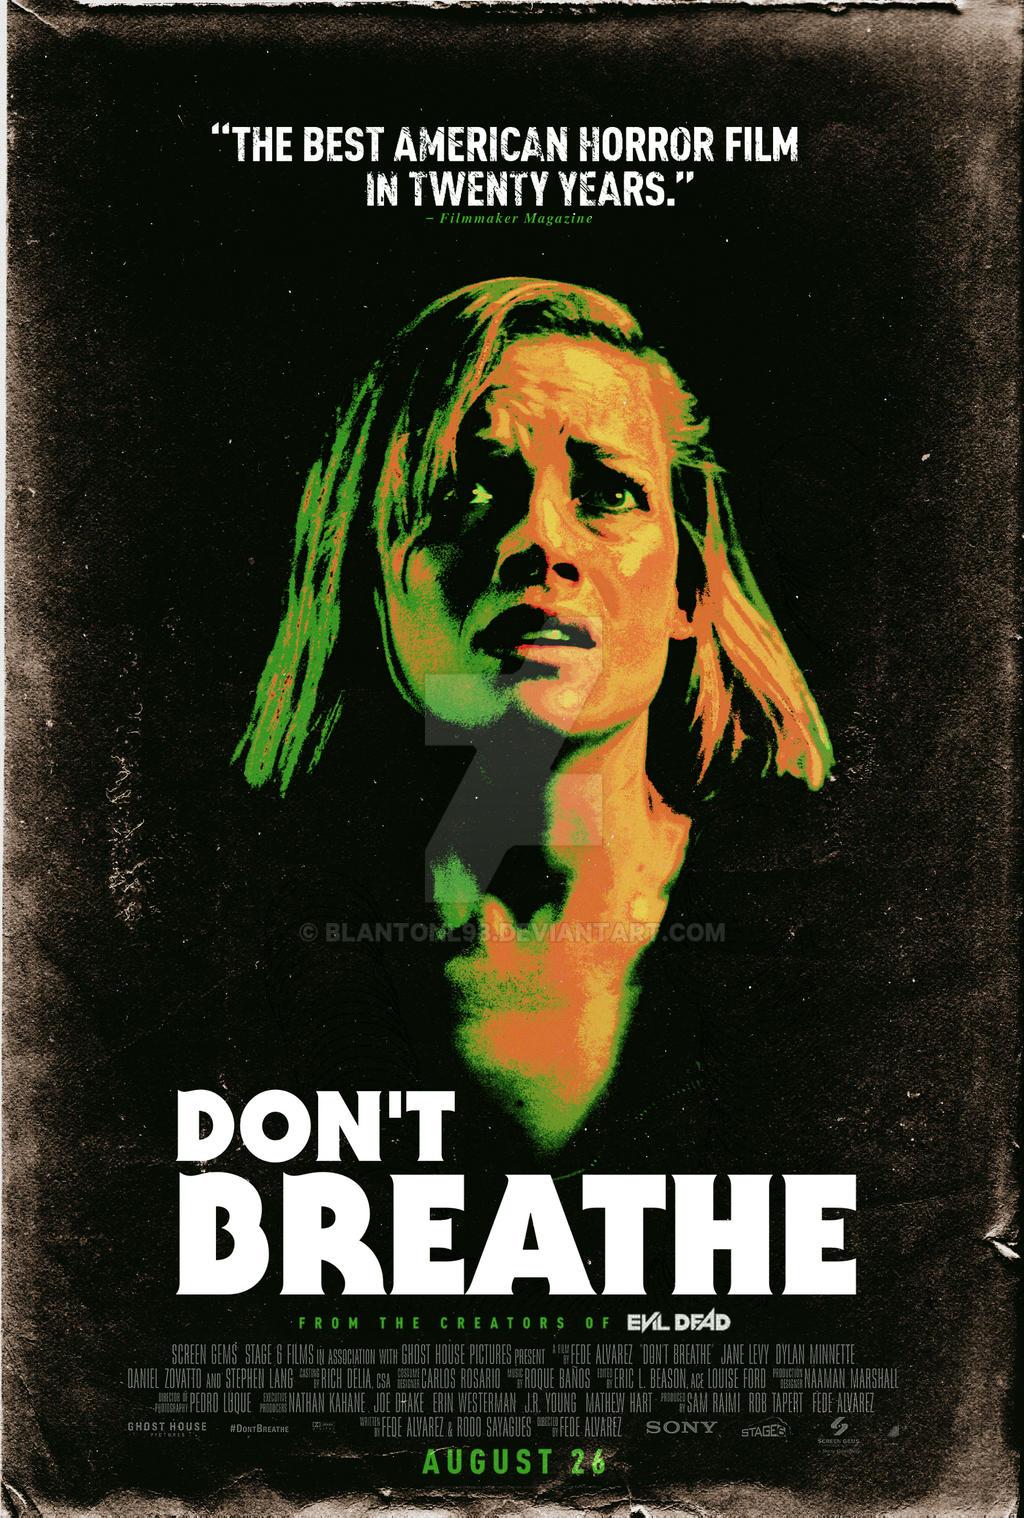 Don't Breathe (Movie Poster) by blantonl98 on DeviantArt